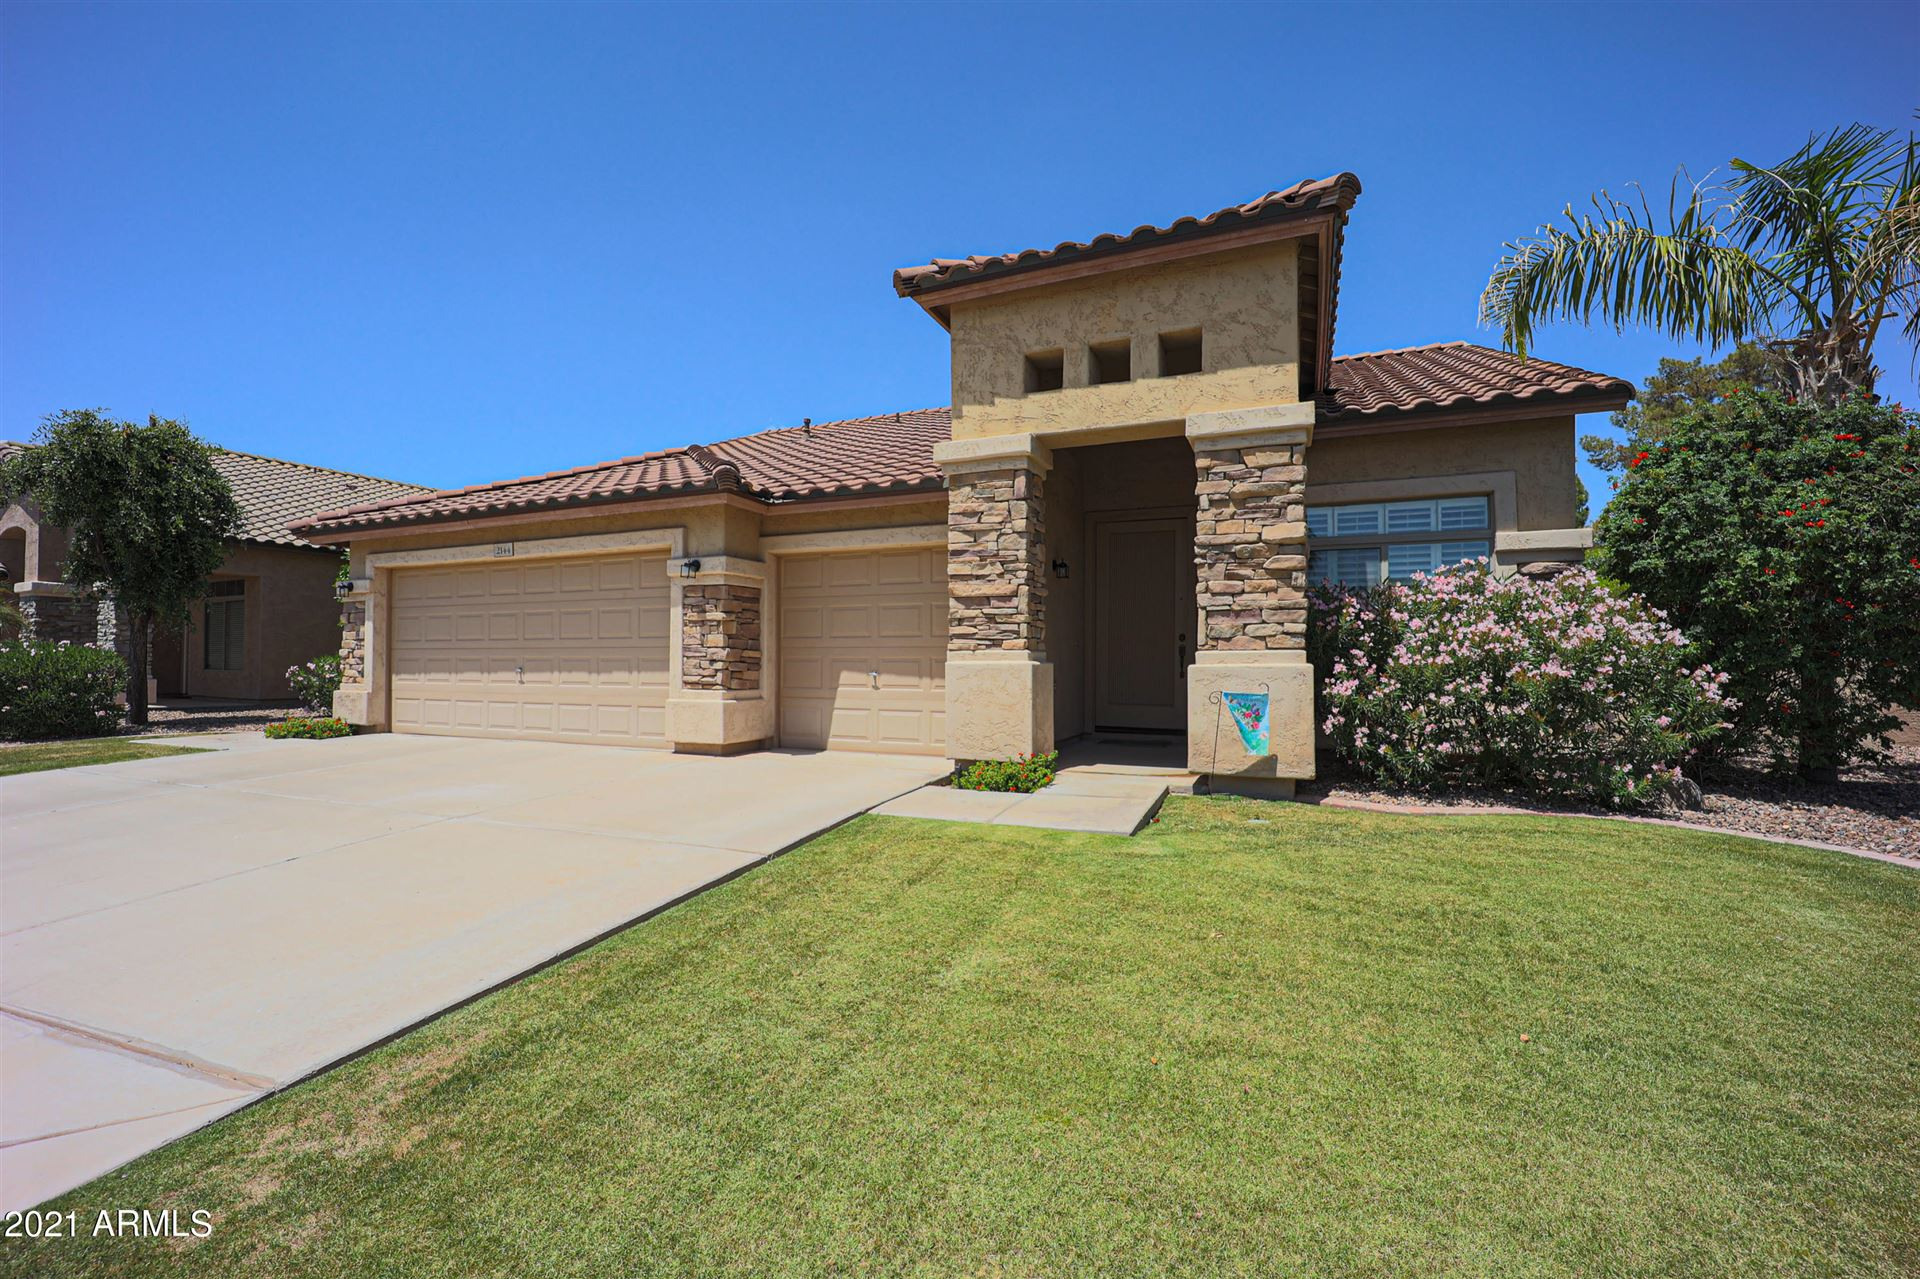 Photo of 2144 W OLIVE Way, Chandler, AZ 85248 (MLS # 6229601)